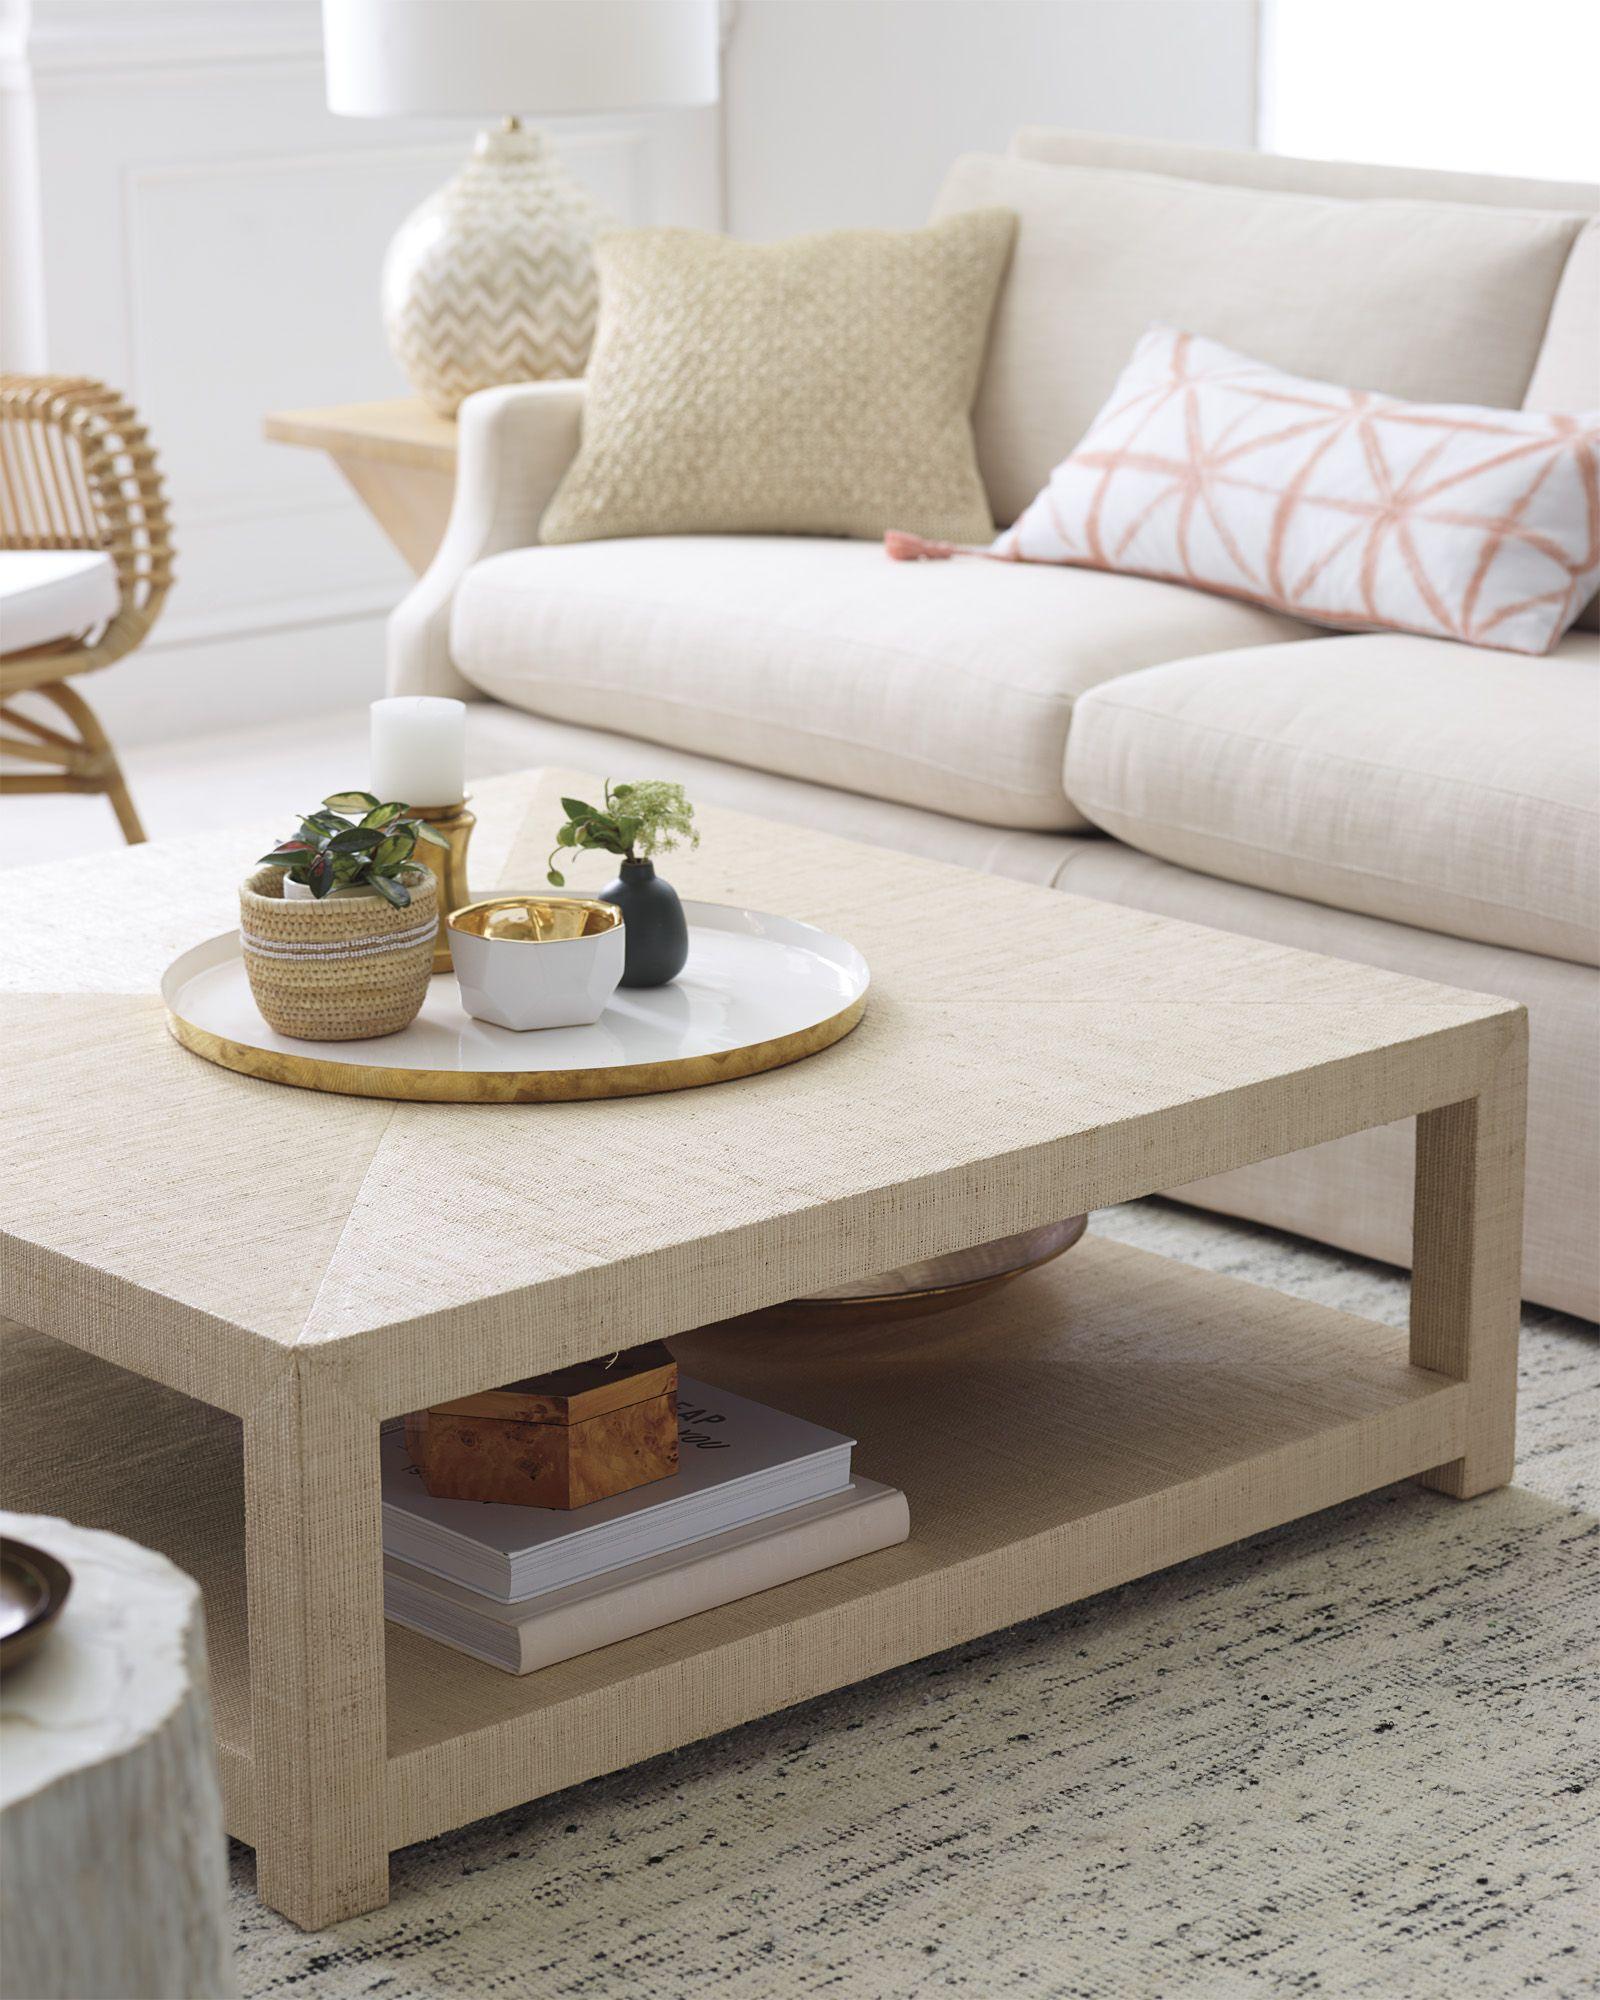 Marine Brass Trays Set Of 3 Coffee Table Coffee Table Square Kid Room Decor [ 2000 x 1600 Pixel ]